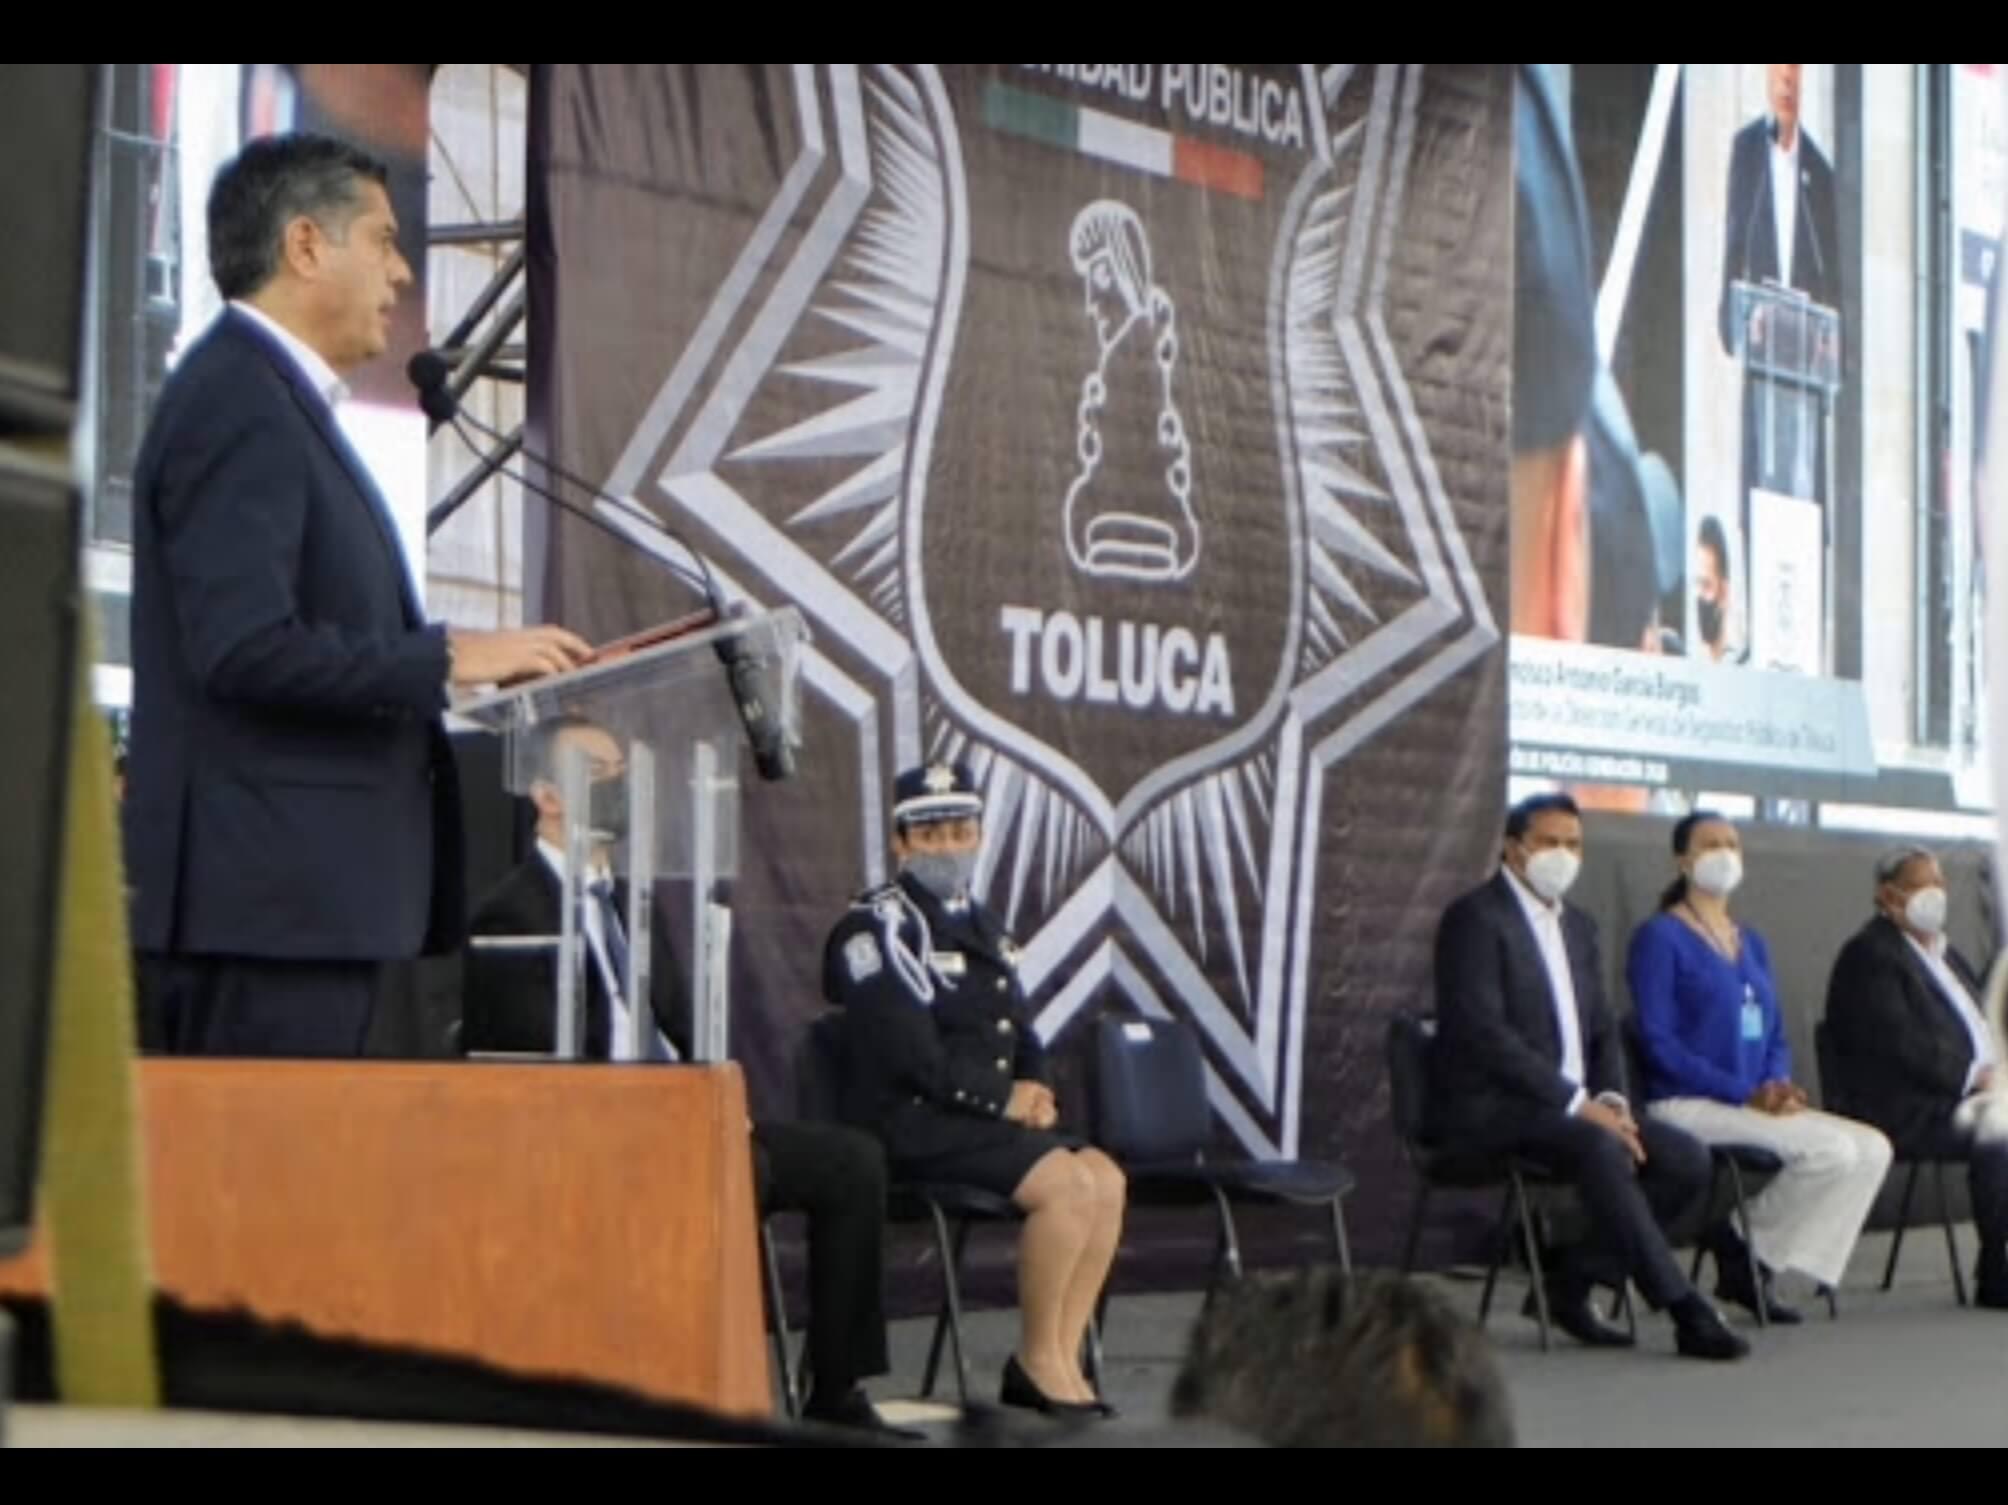 De asesor del alcalde a titular de seguridad en Toluca